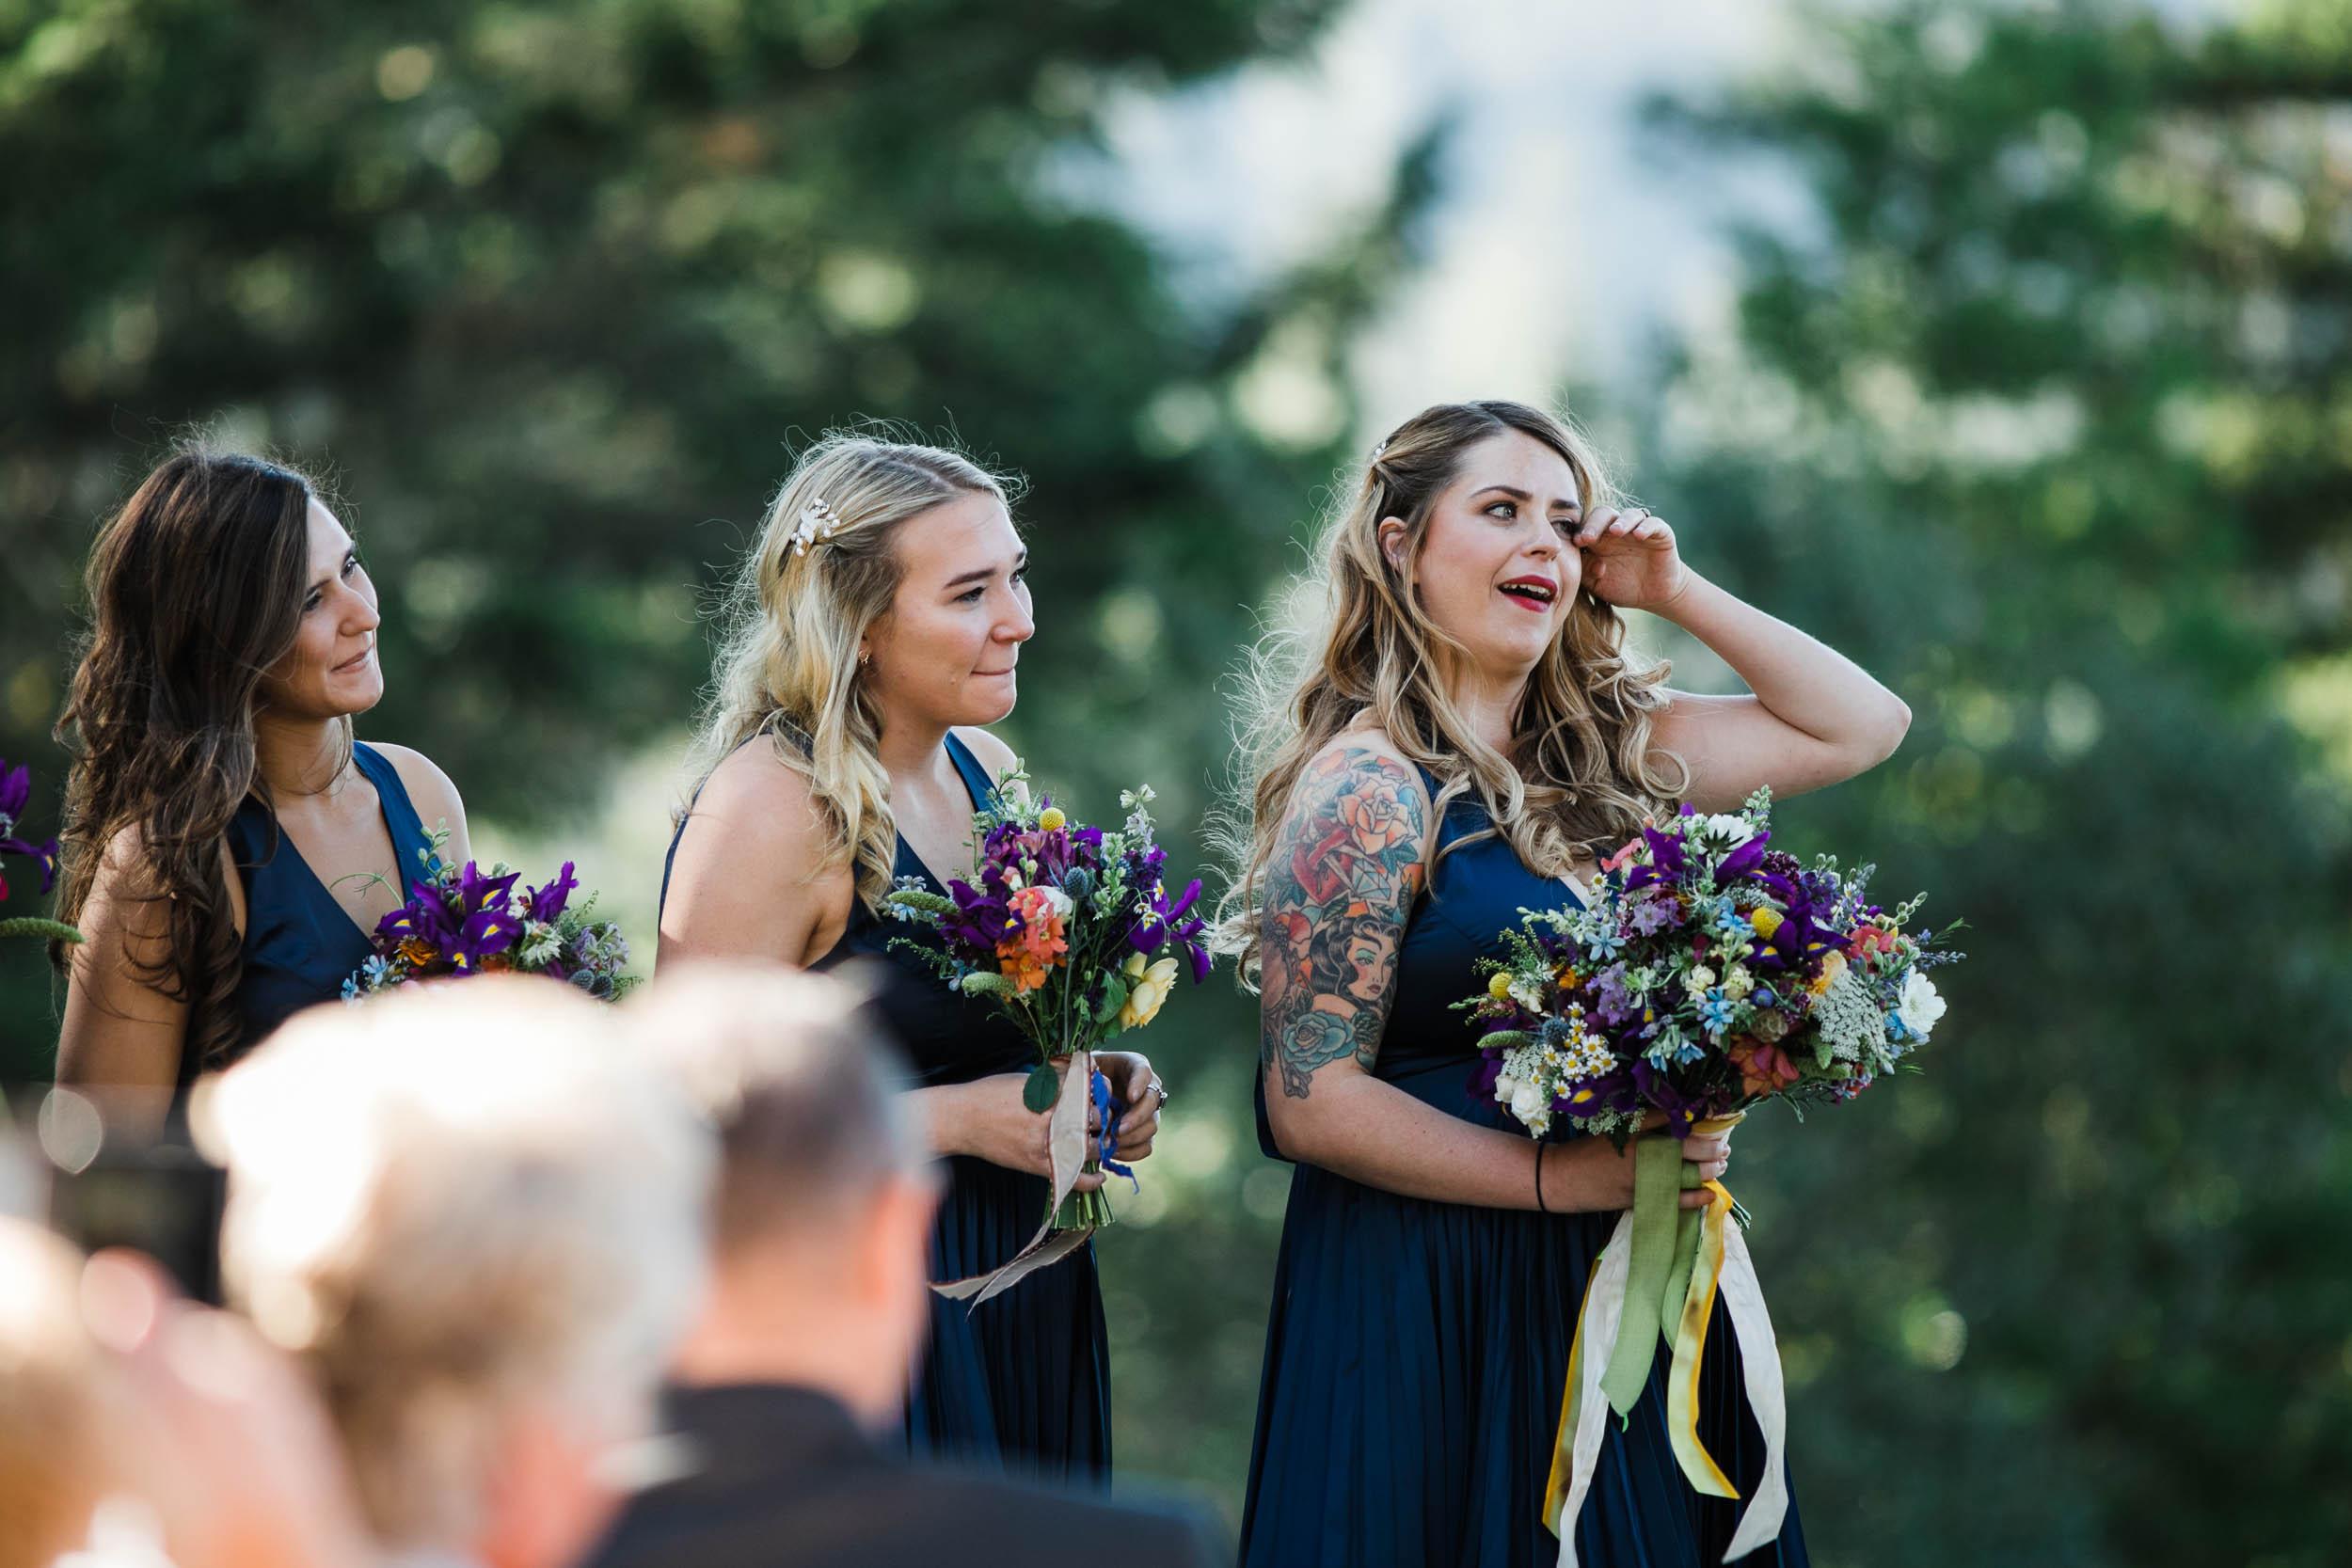 10717_A+C_Wild Iris Philo Wedding_Buena Lane Photography_0923ER.jpg